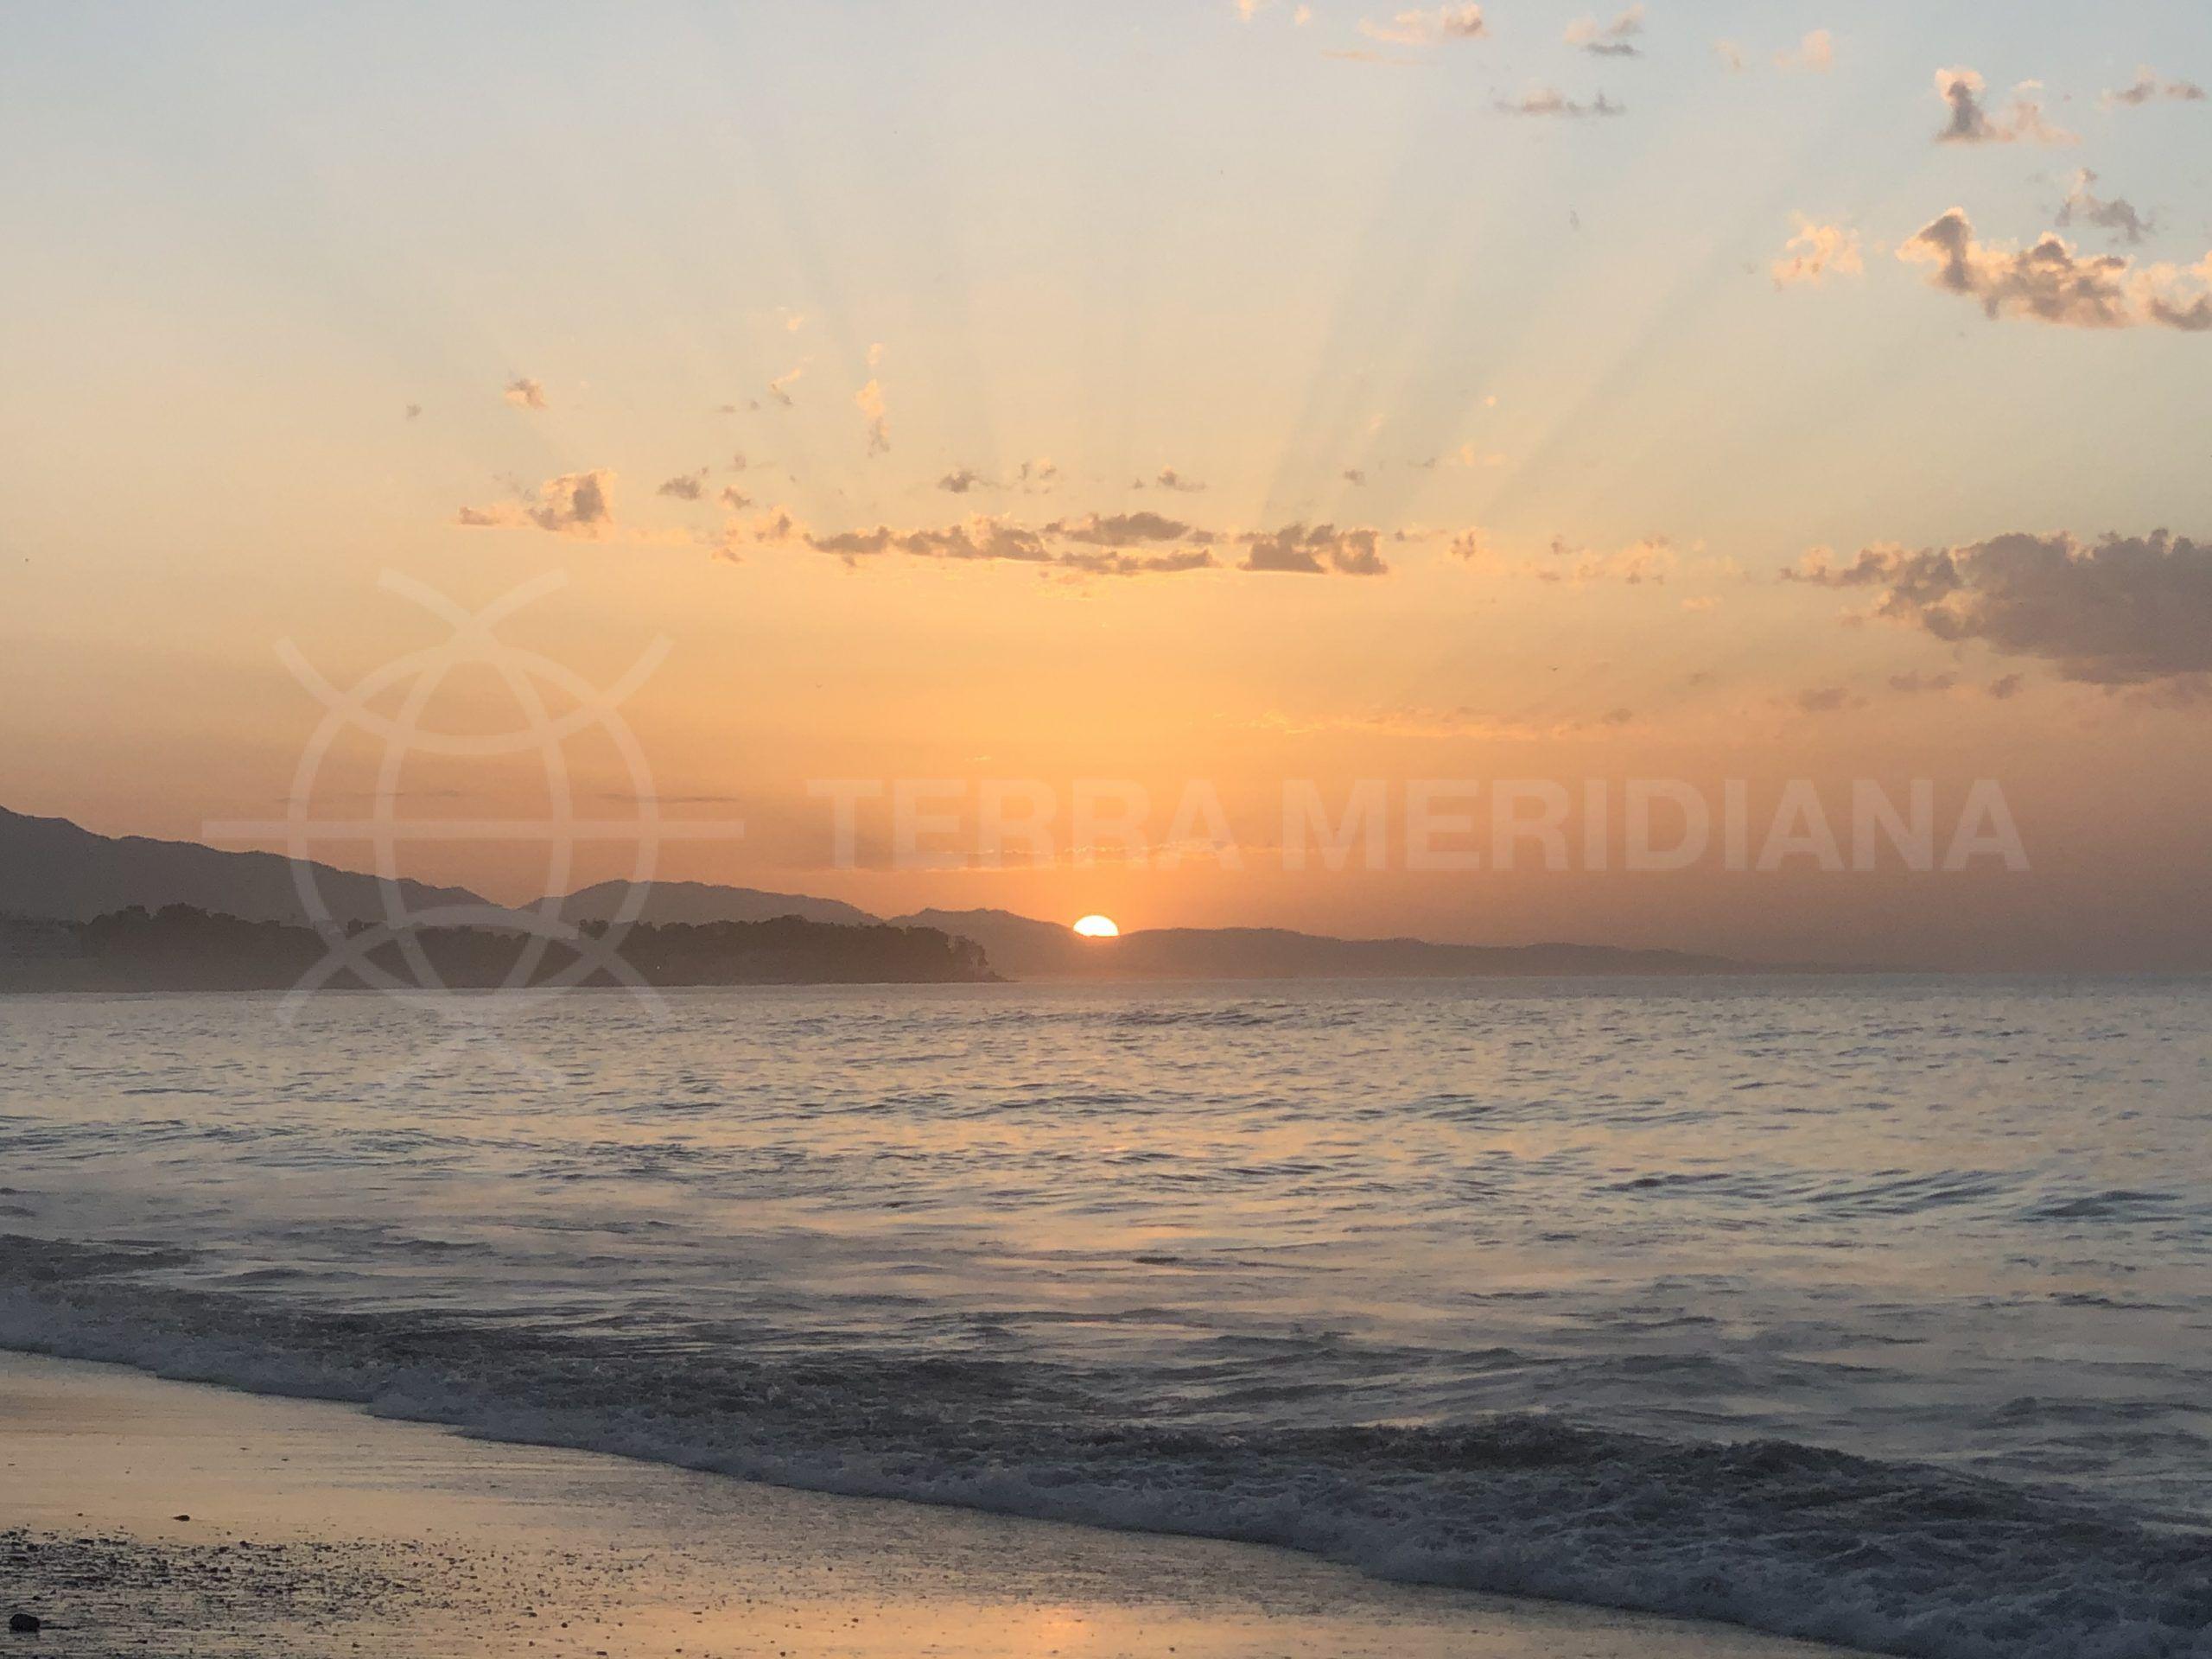 The sun is still shining on the Costa del Sol